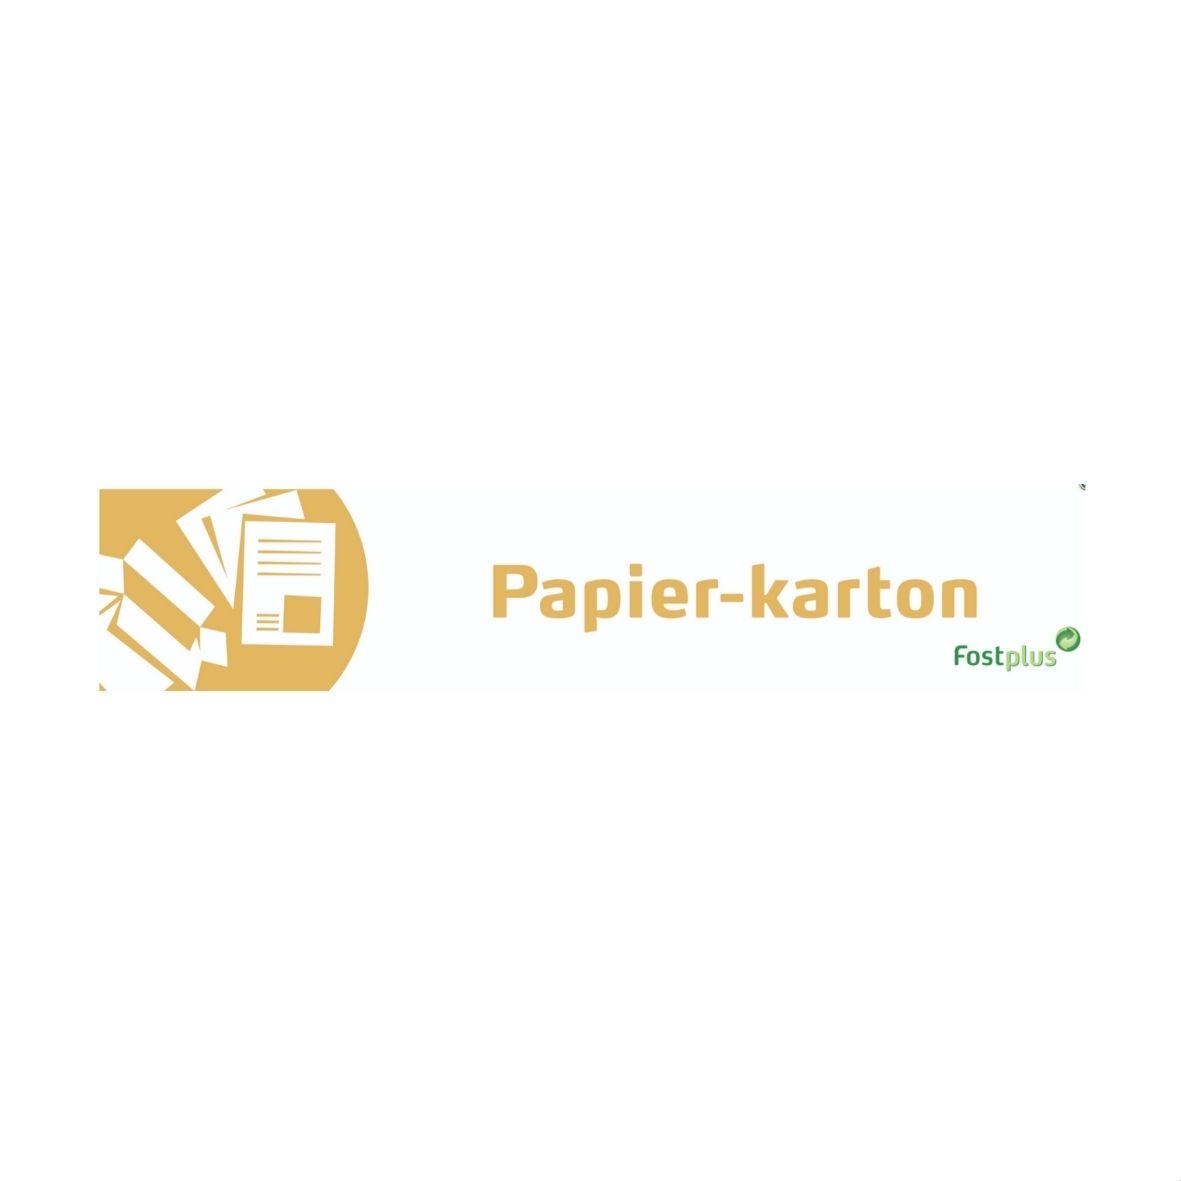 P&K Sticker 20x4